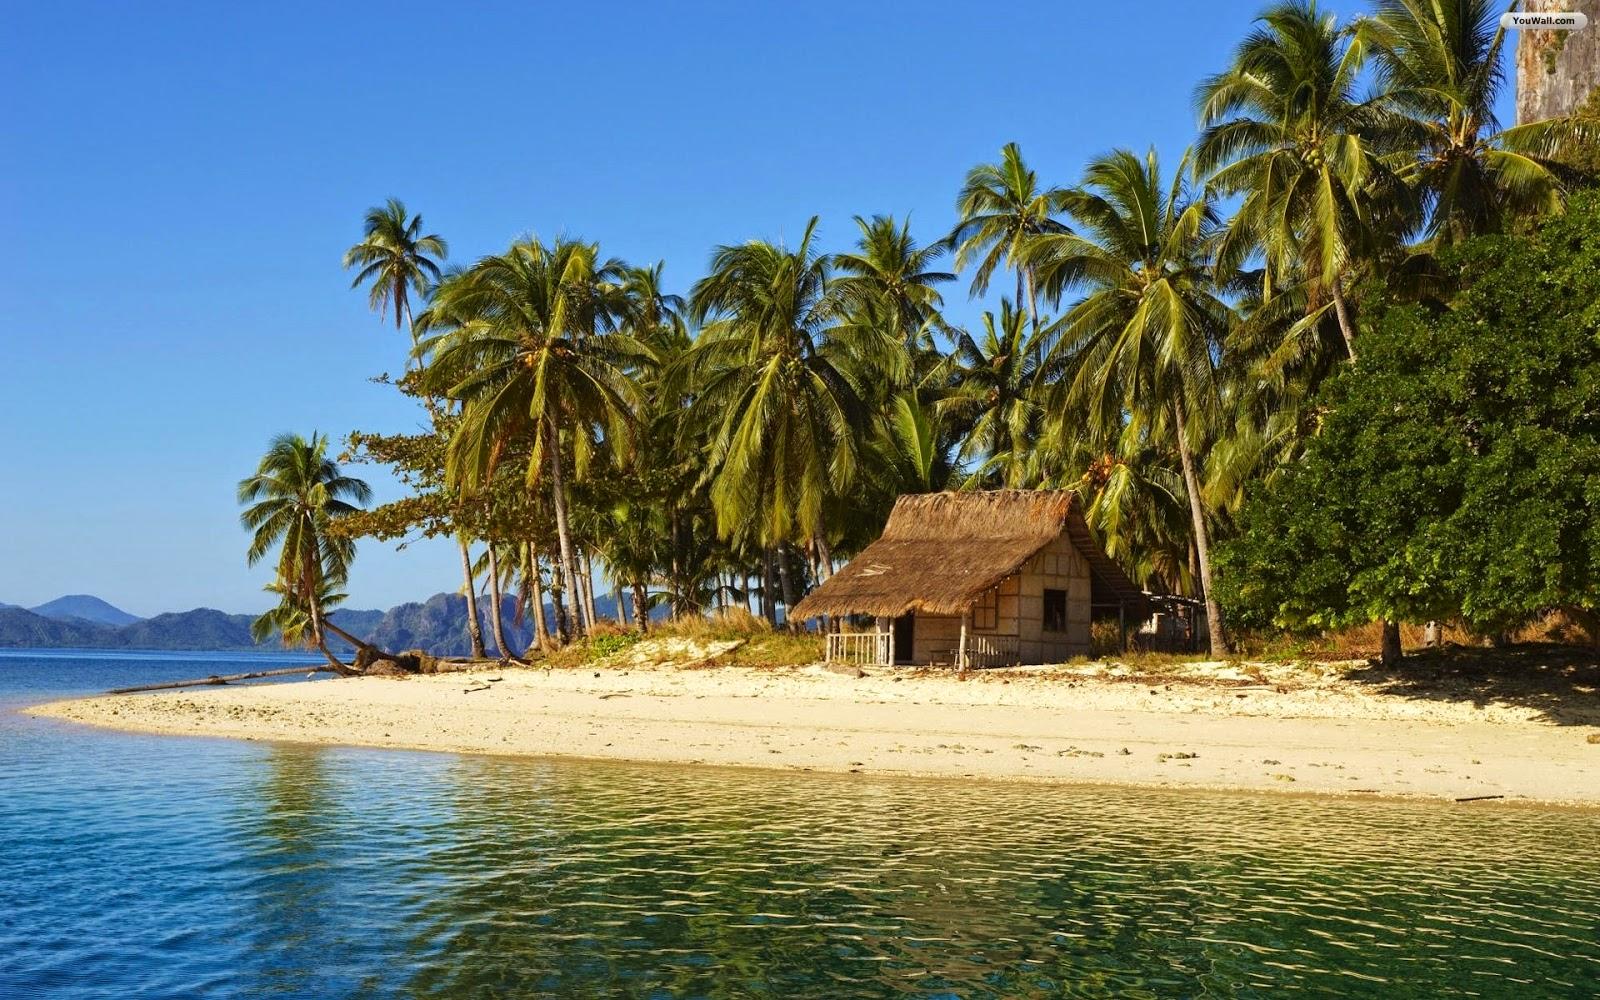 World Most Beautiful Dream Beach Maldives Images for Desktop Backgrounds